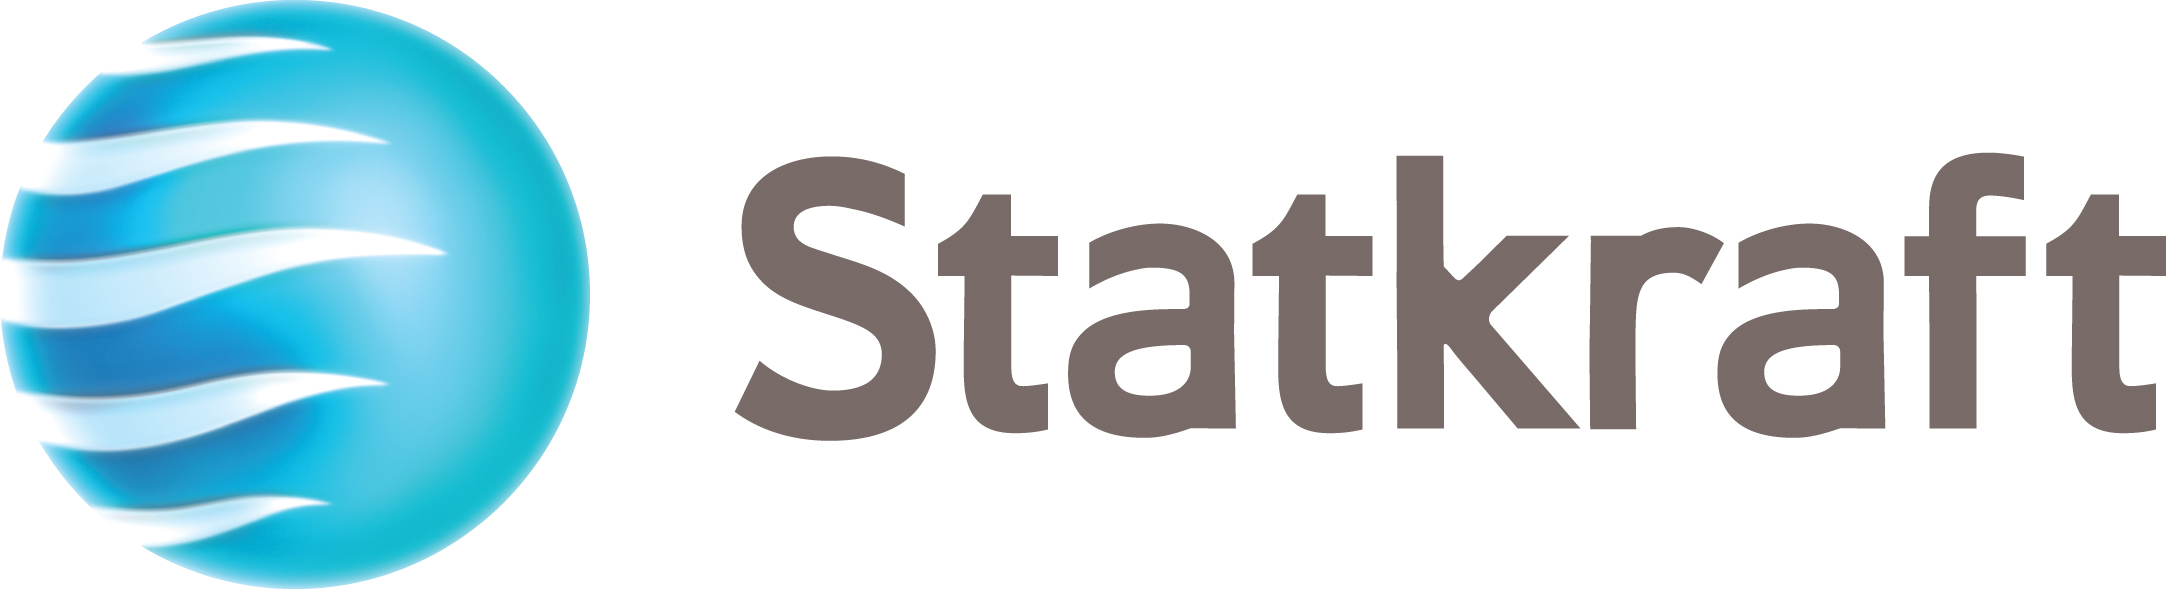 Statkraft AS